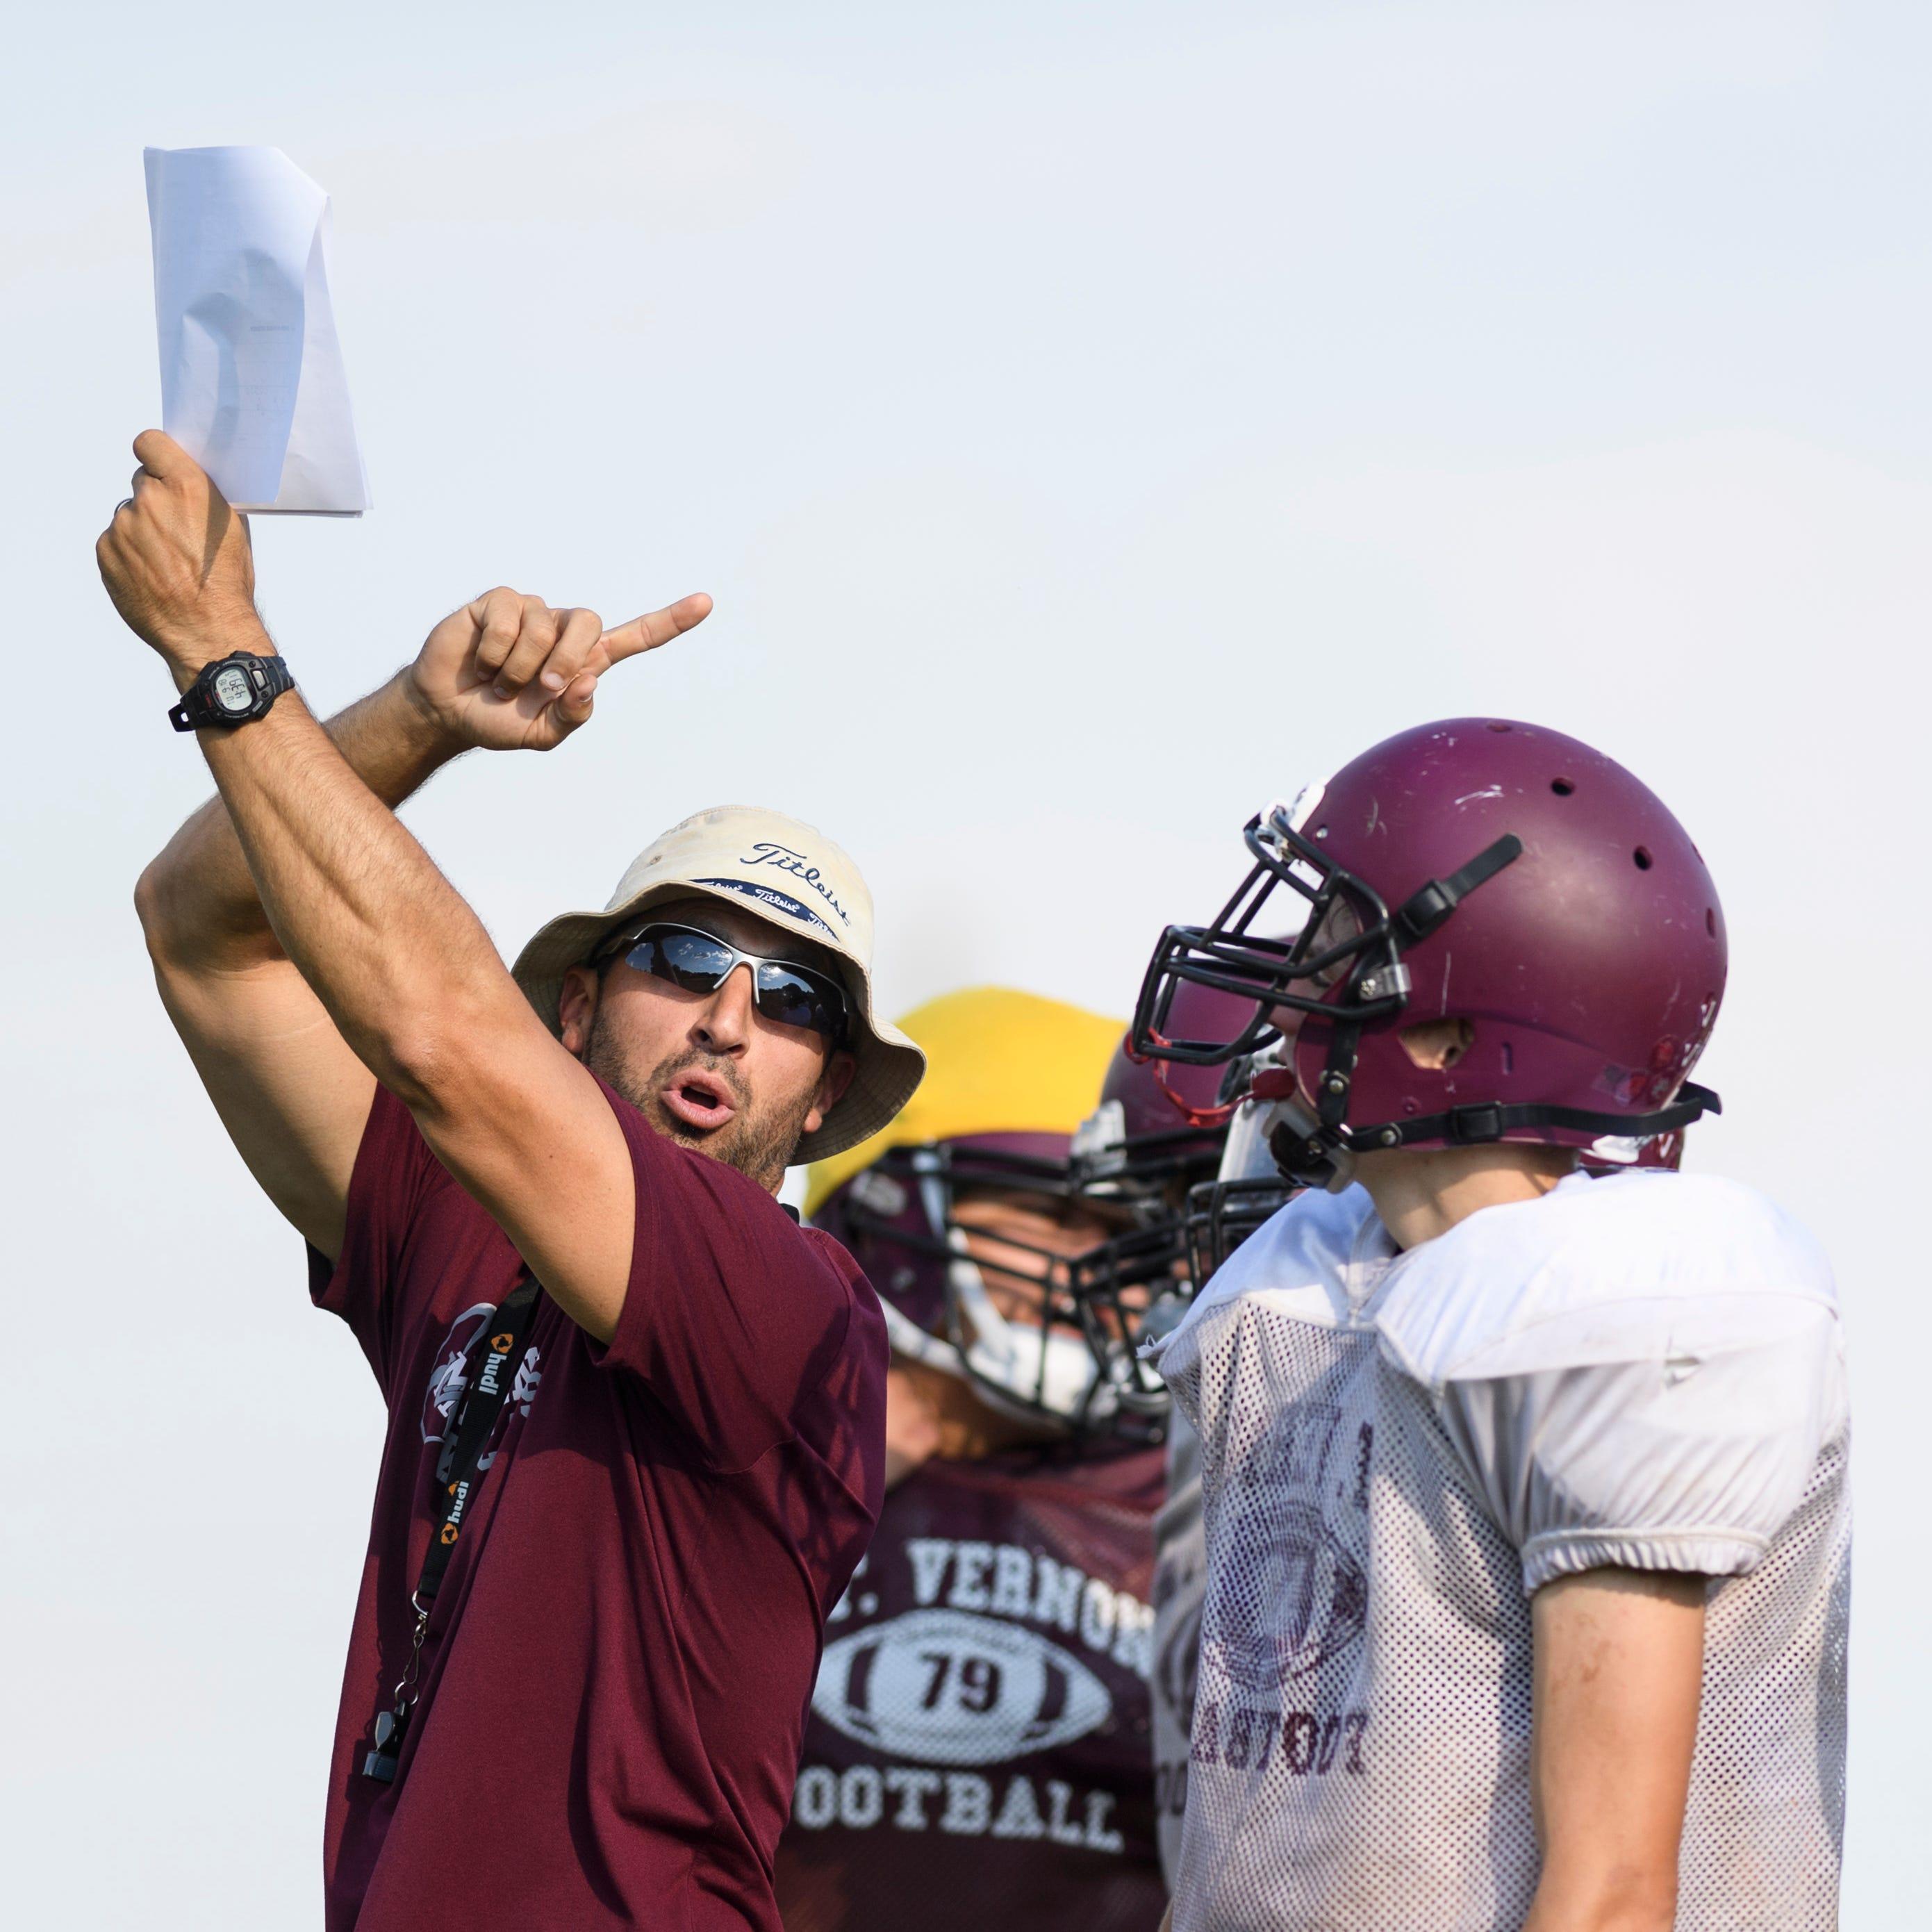 Cory Brunson working his magic with Mount Vernon football program